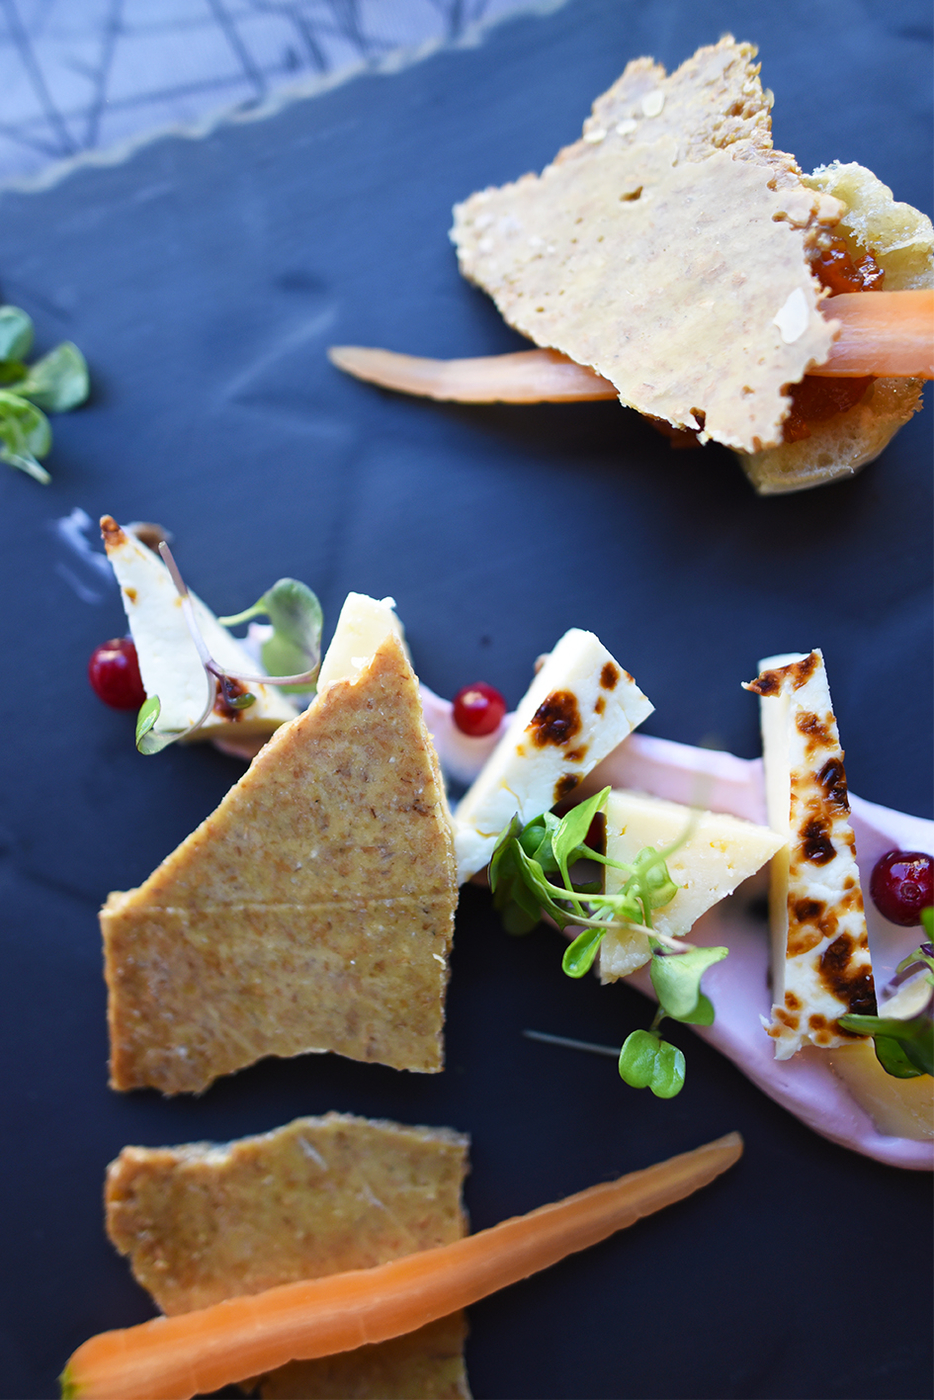 ravintola-kaarna-sok-helsinki-sundayblondie-3.jpg